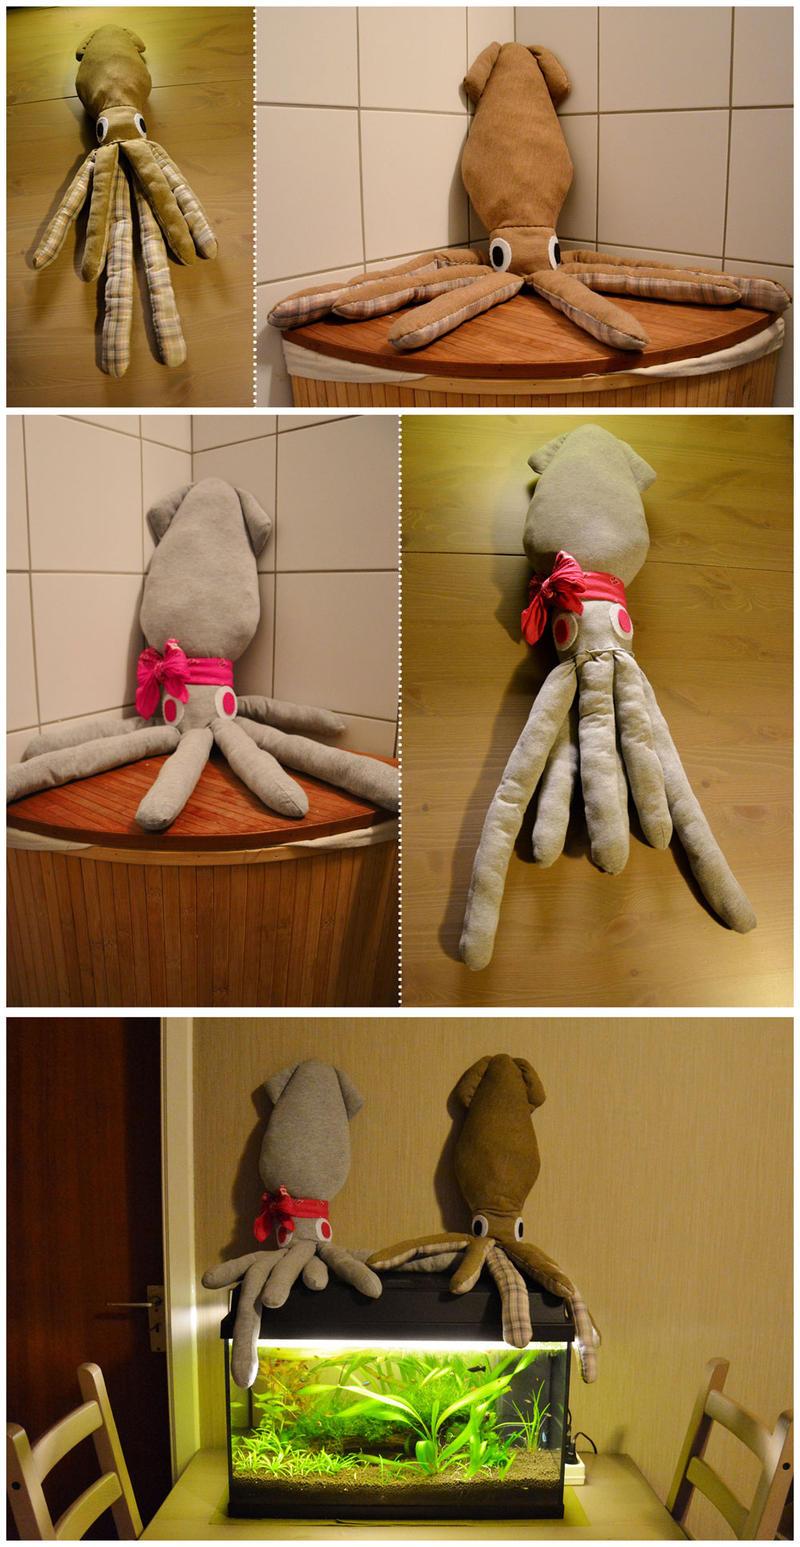 Squid plush prototype by Shegoran